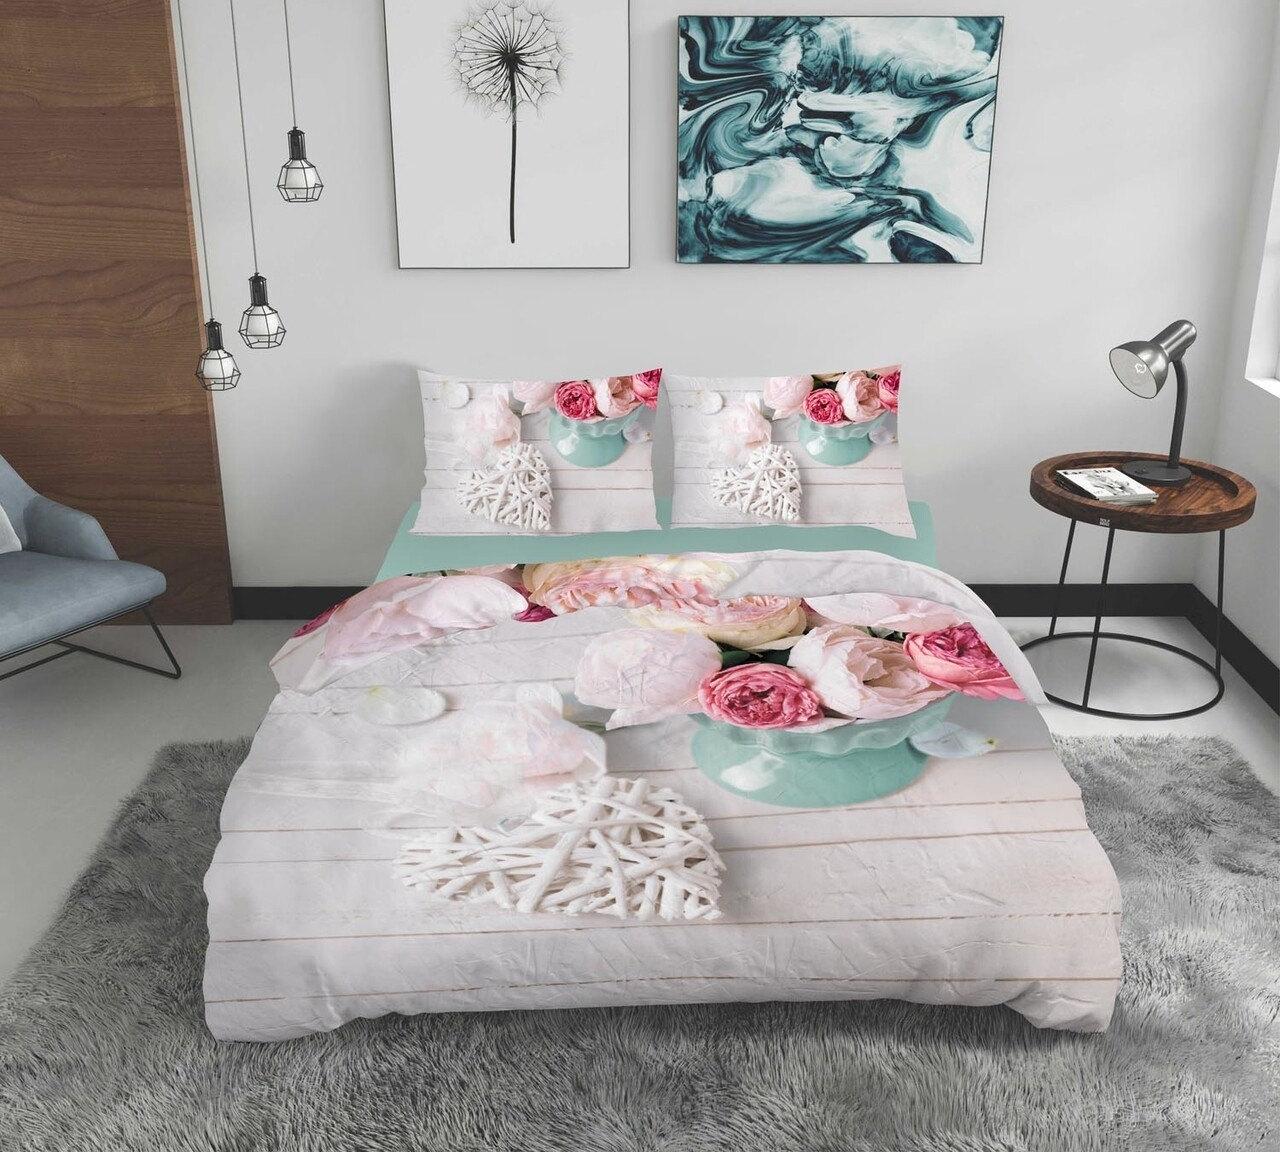 Lenjerie de pat dubla Romance, Bedora, 4 piese, 200x220, 100% bumbac, multicolor